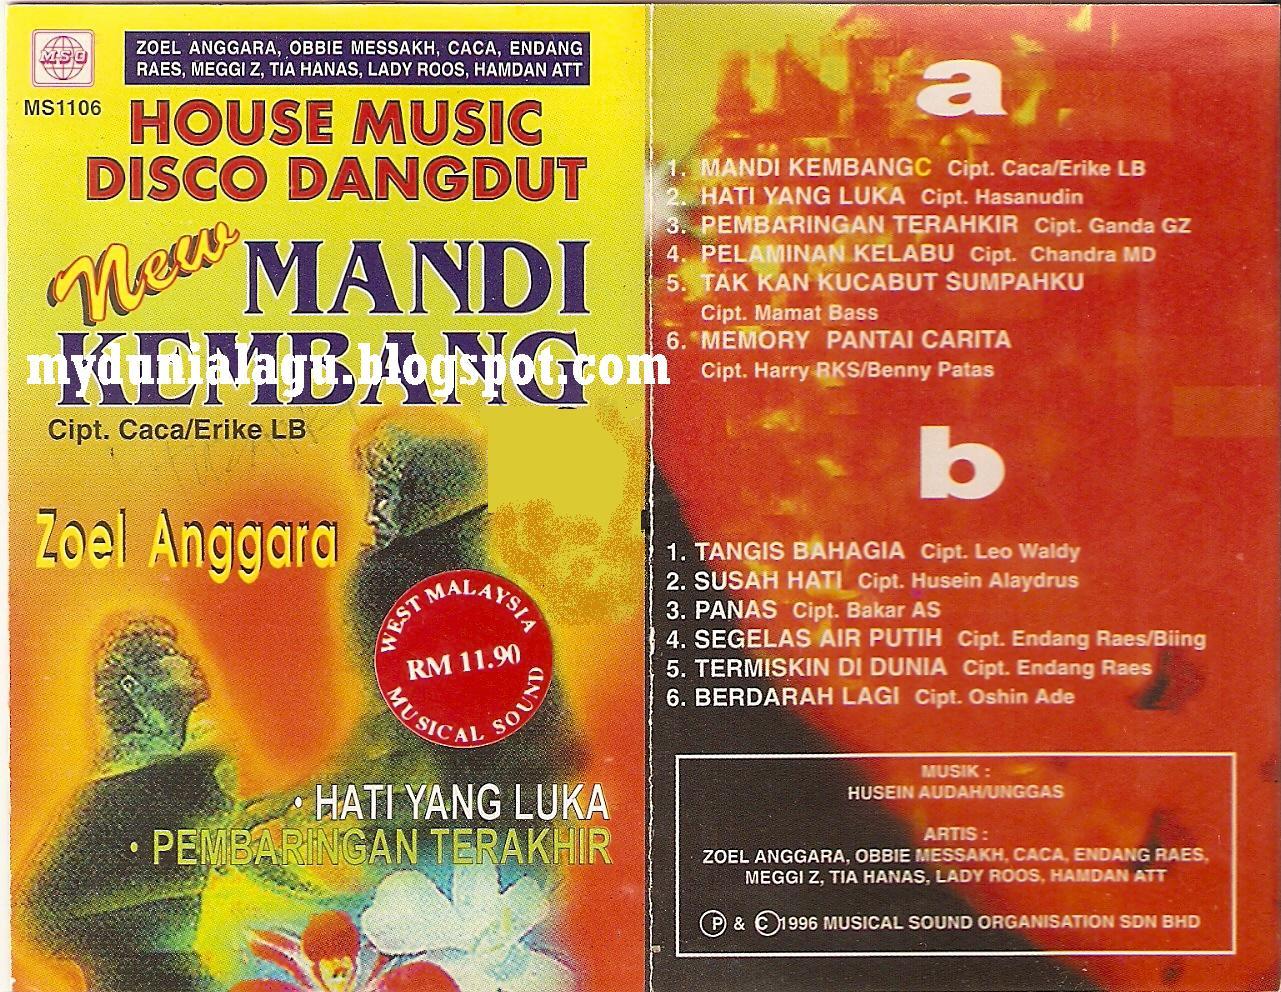 Lagu ajib house music disco dangdut mandi kembang 1996 for House music 1996